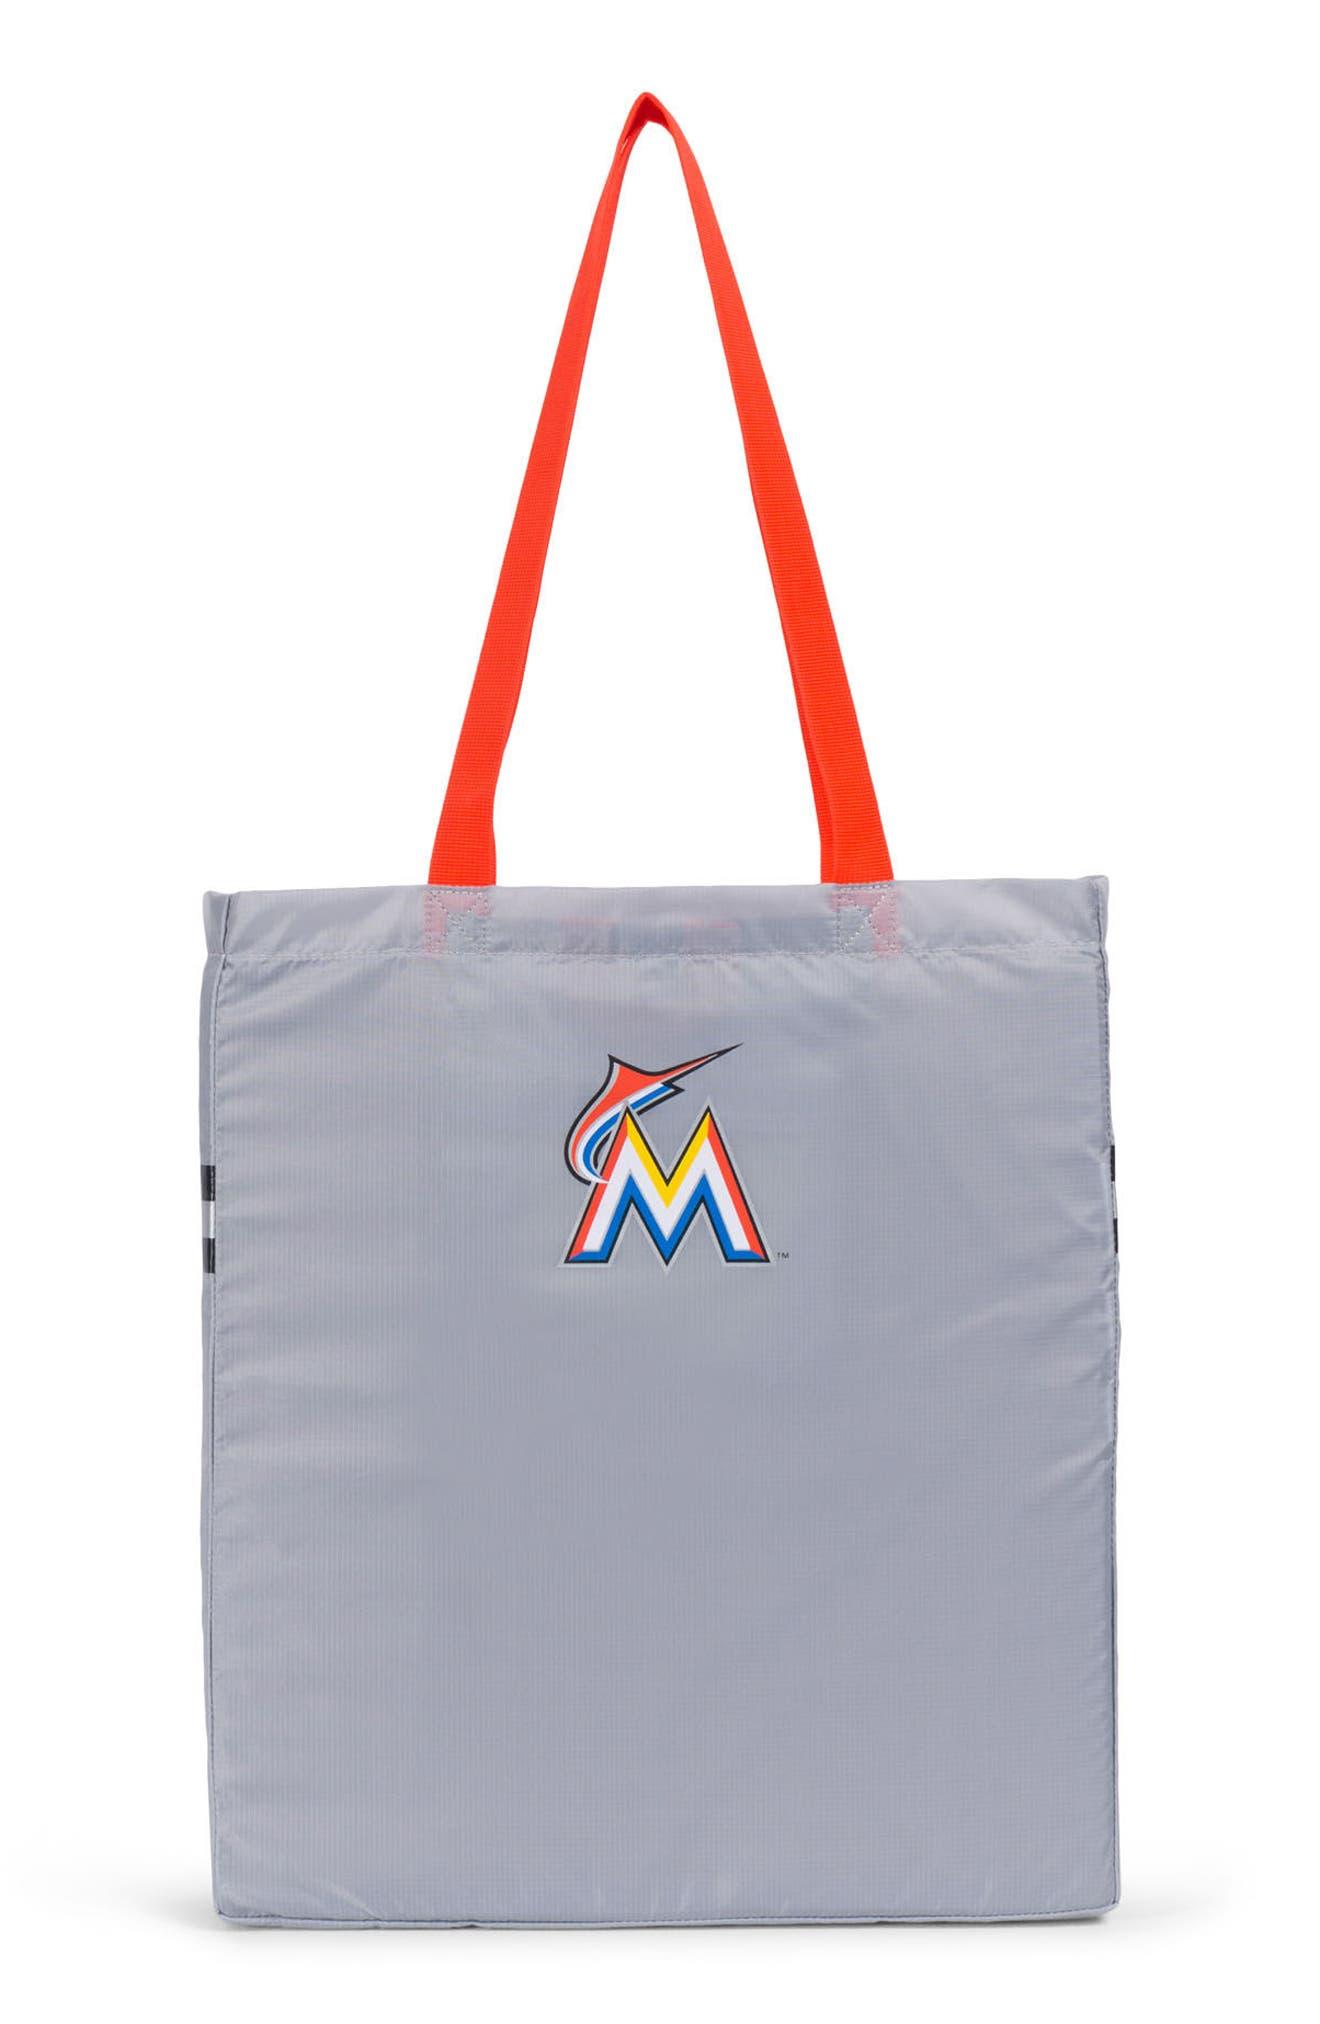 Packable - MLB National League Tote Bag,                             Alternate thumbnail 2, color,                             MIAMI MARLINS